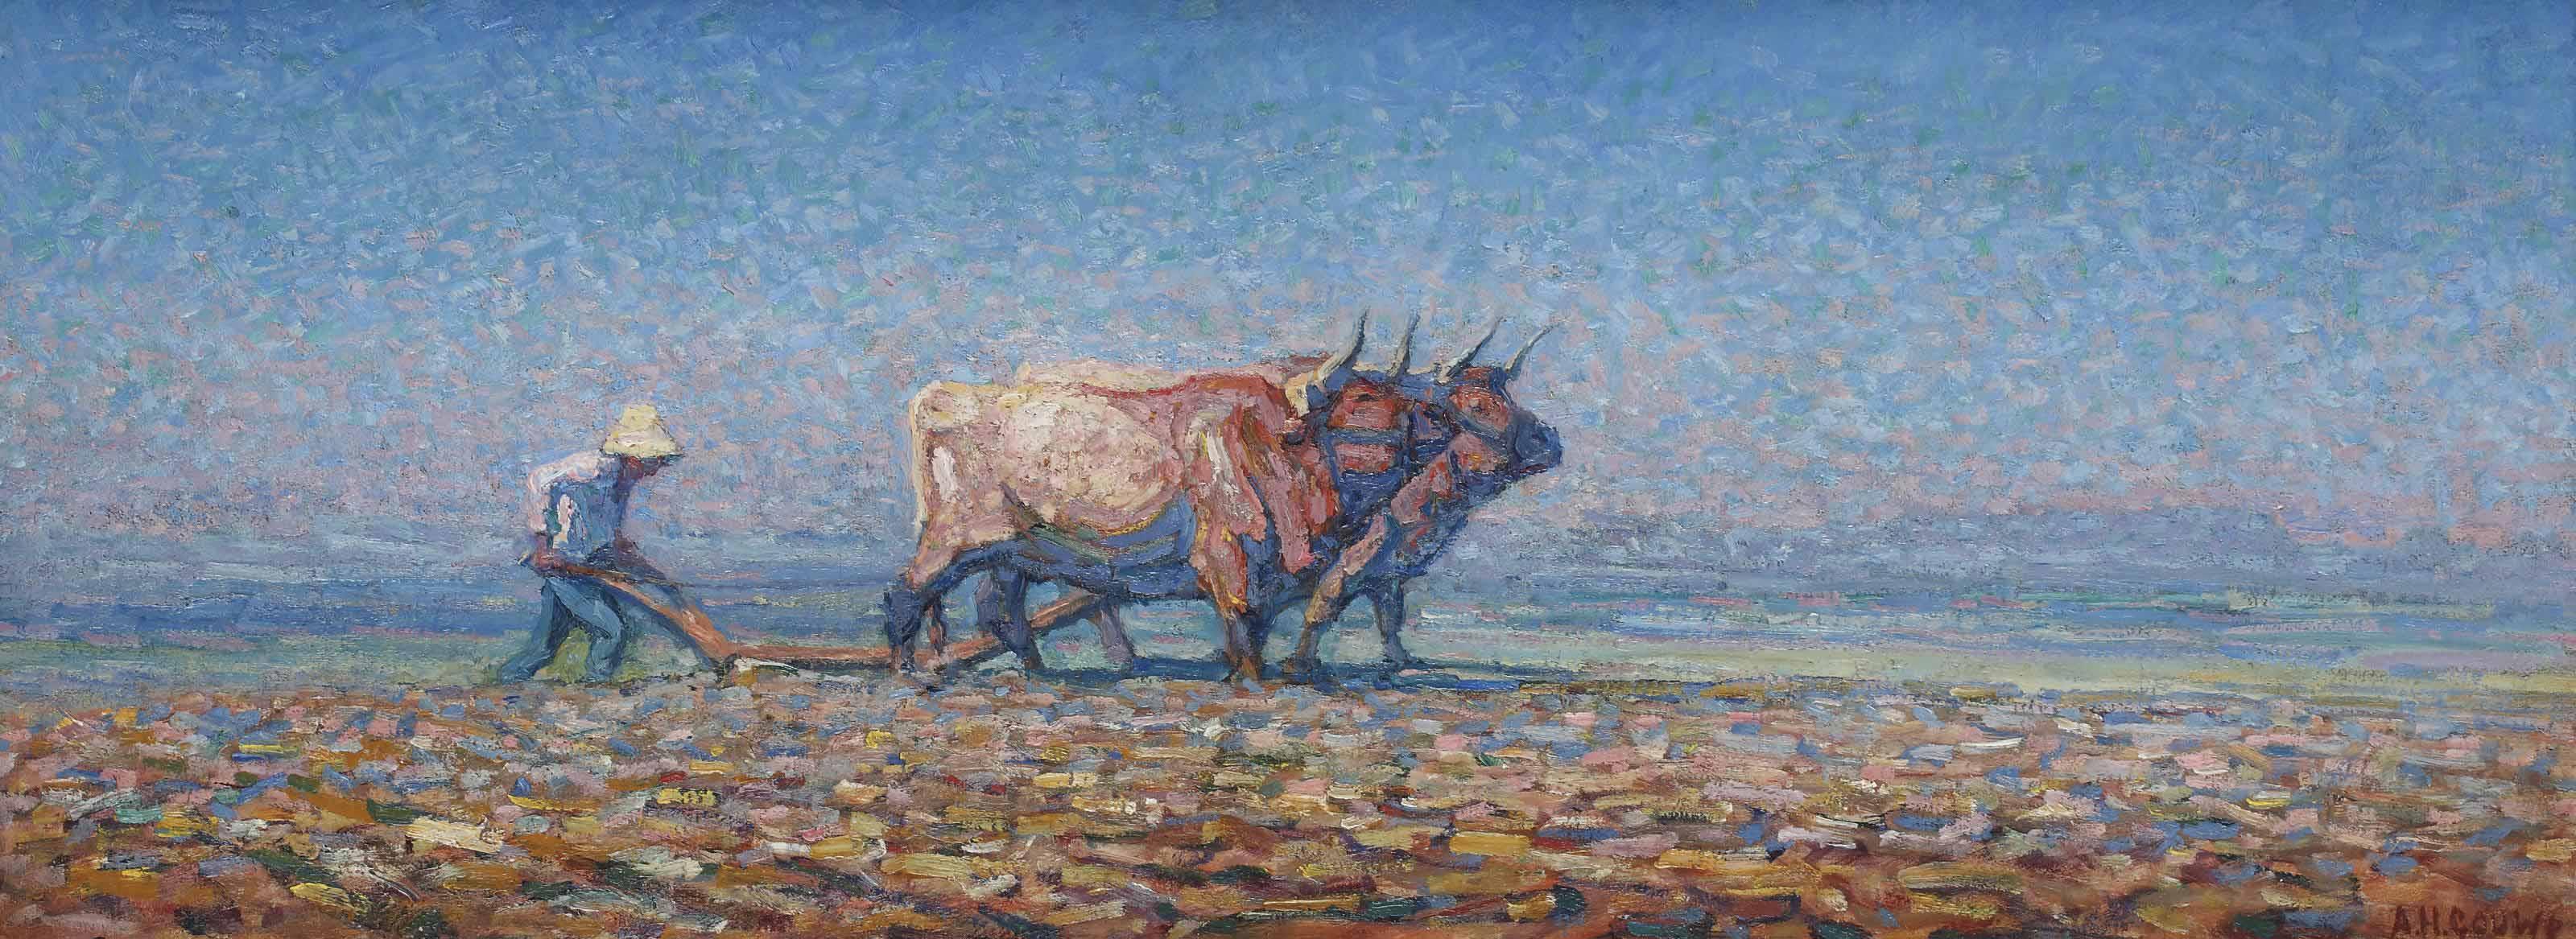 Ploughing farmer